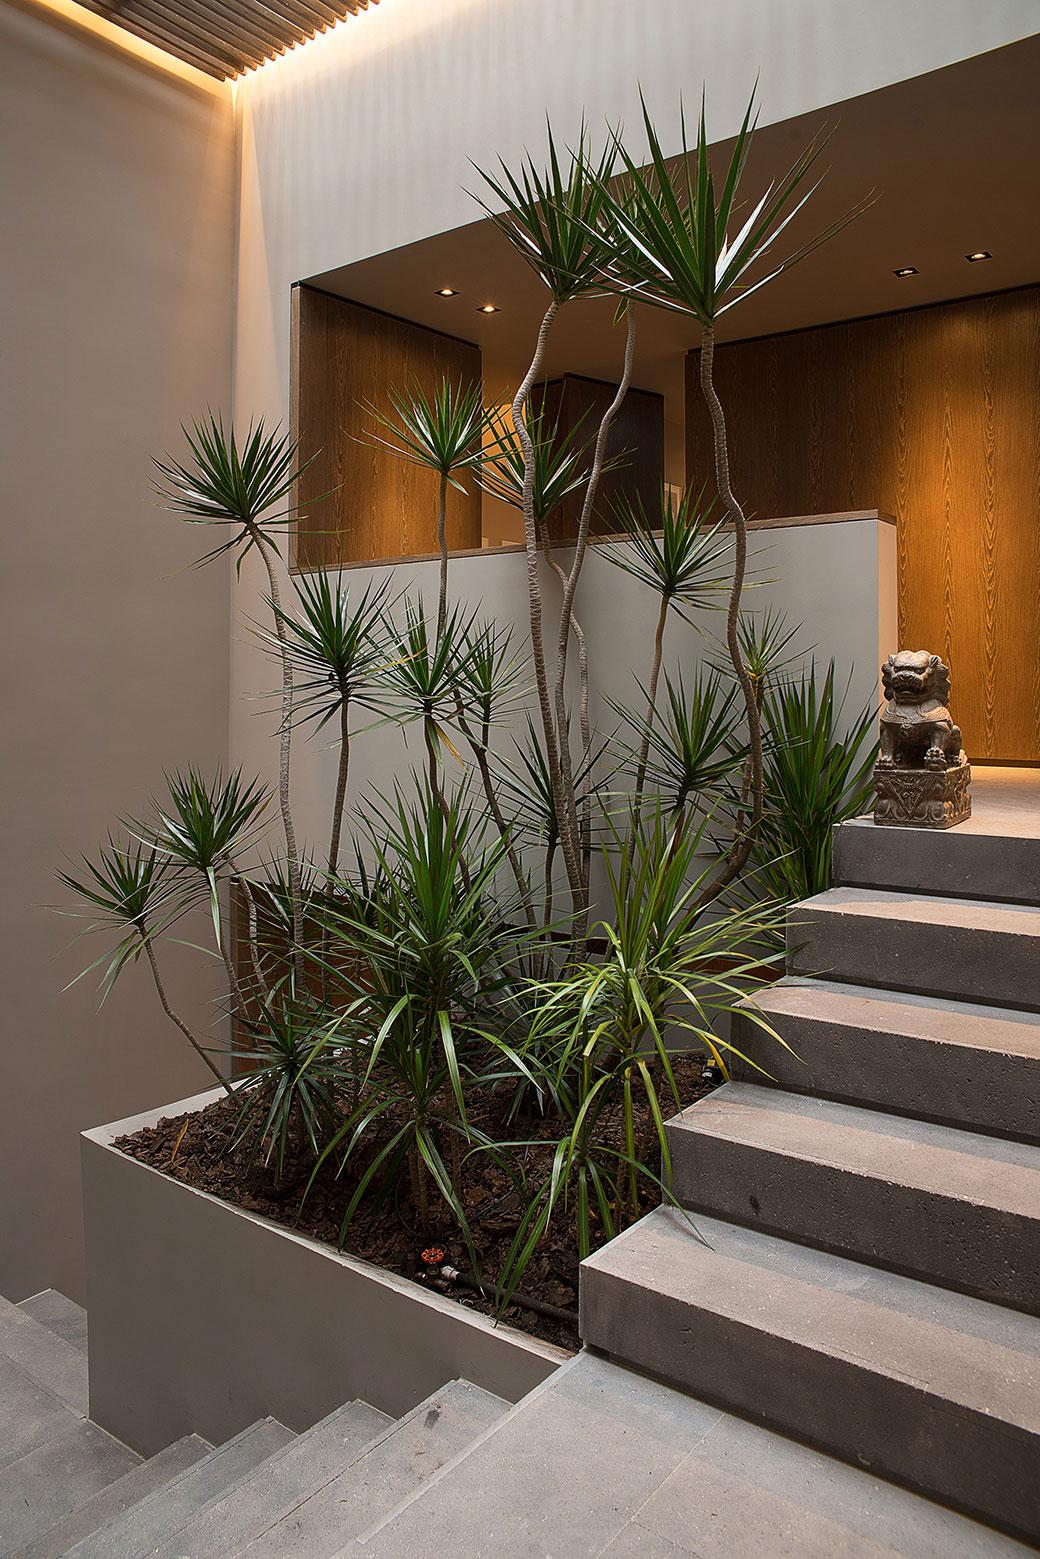 Barrancas-huset erbjuder en inblick i lyxlivet 10 Barrancas-huset erbjuder en inblick i lyxlivet